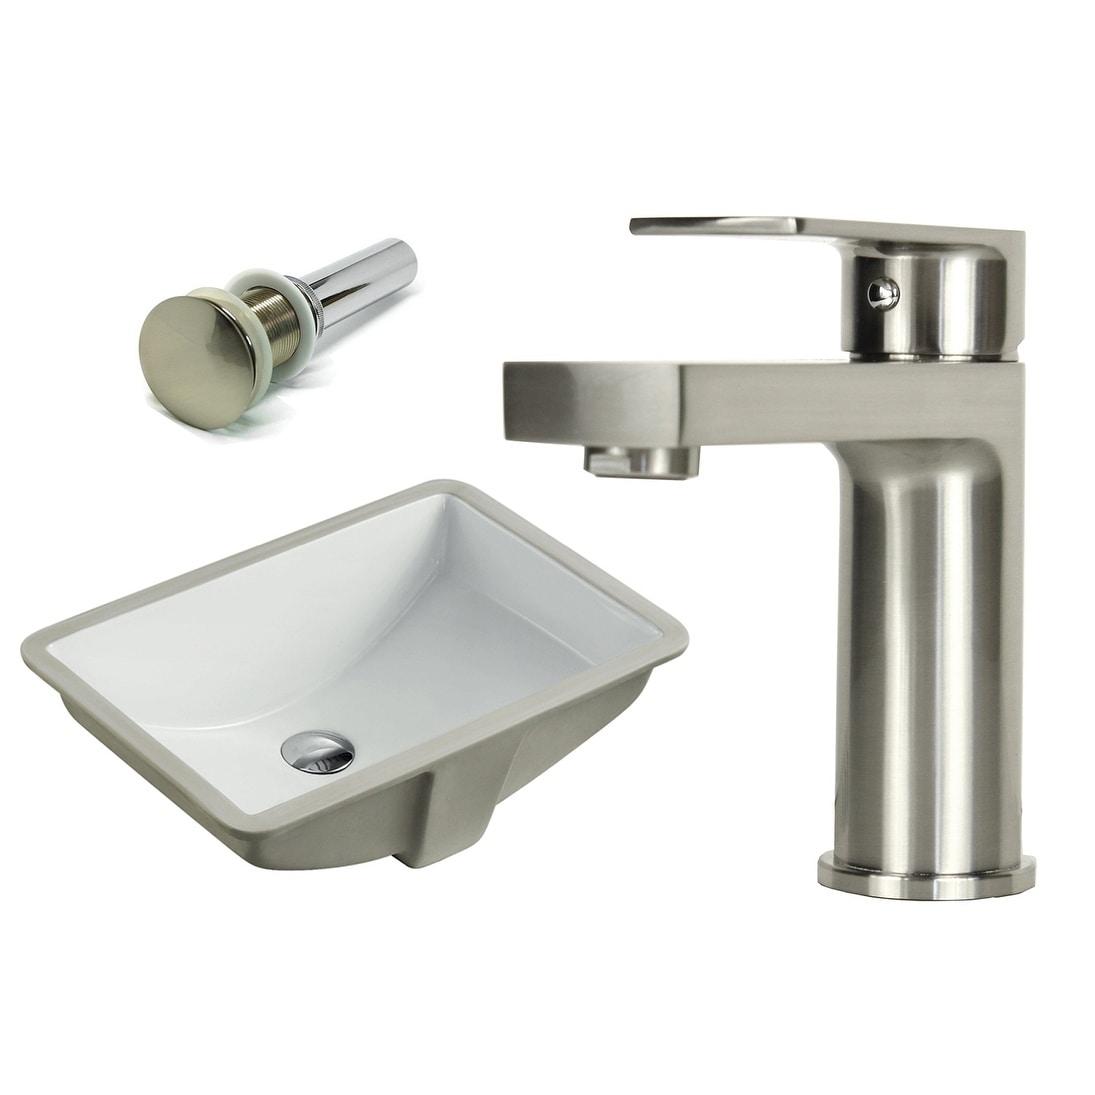 Sink /& Brushed Nickel Popup-Drain Combo Rectangle Ceramic Bathroom Vessel Faucet